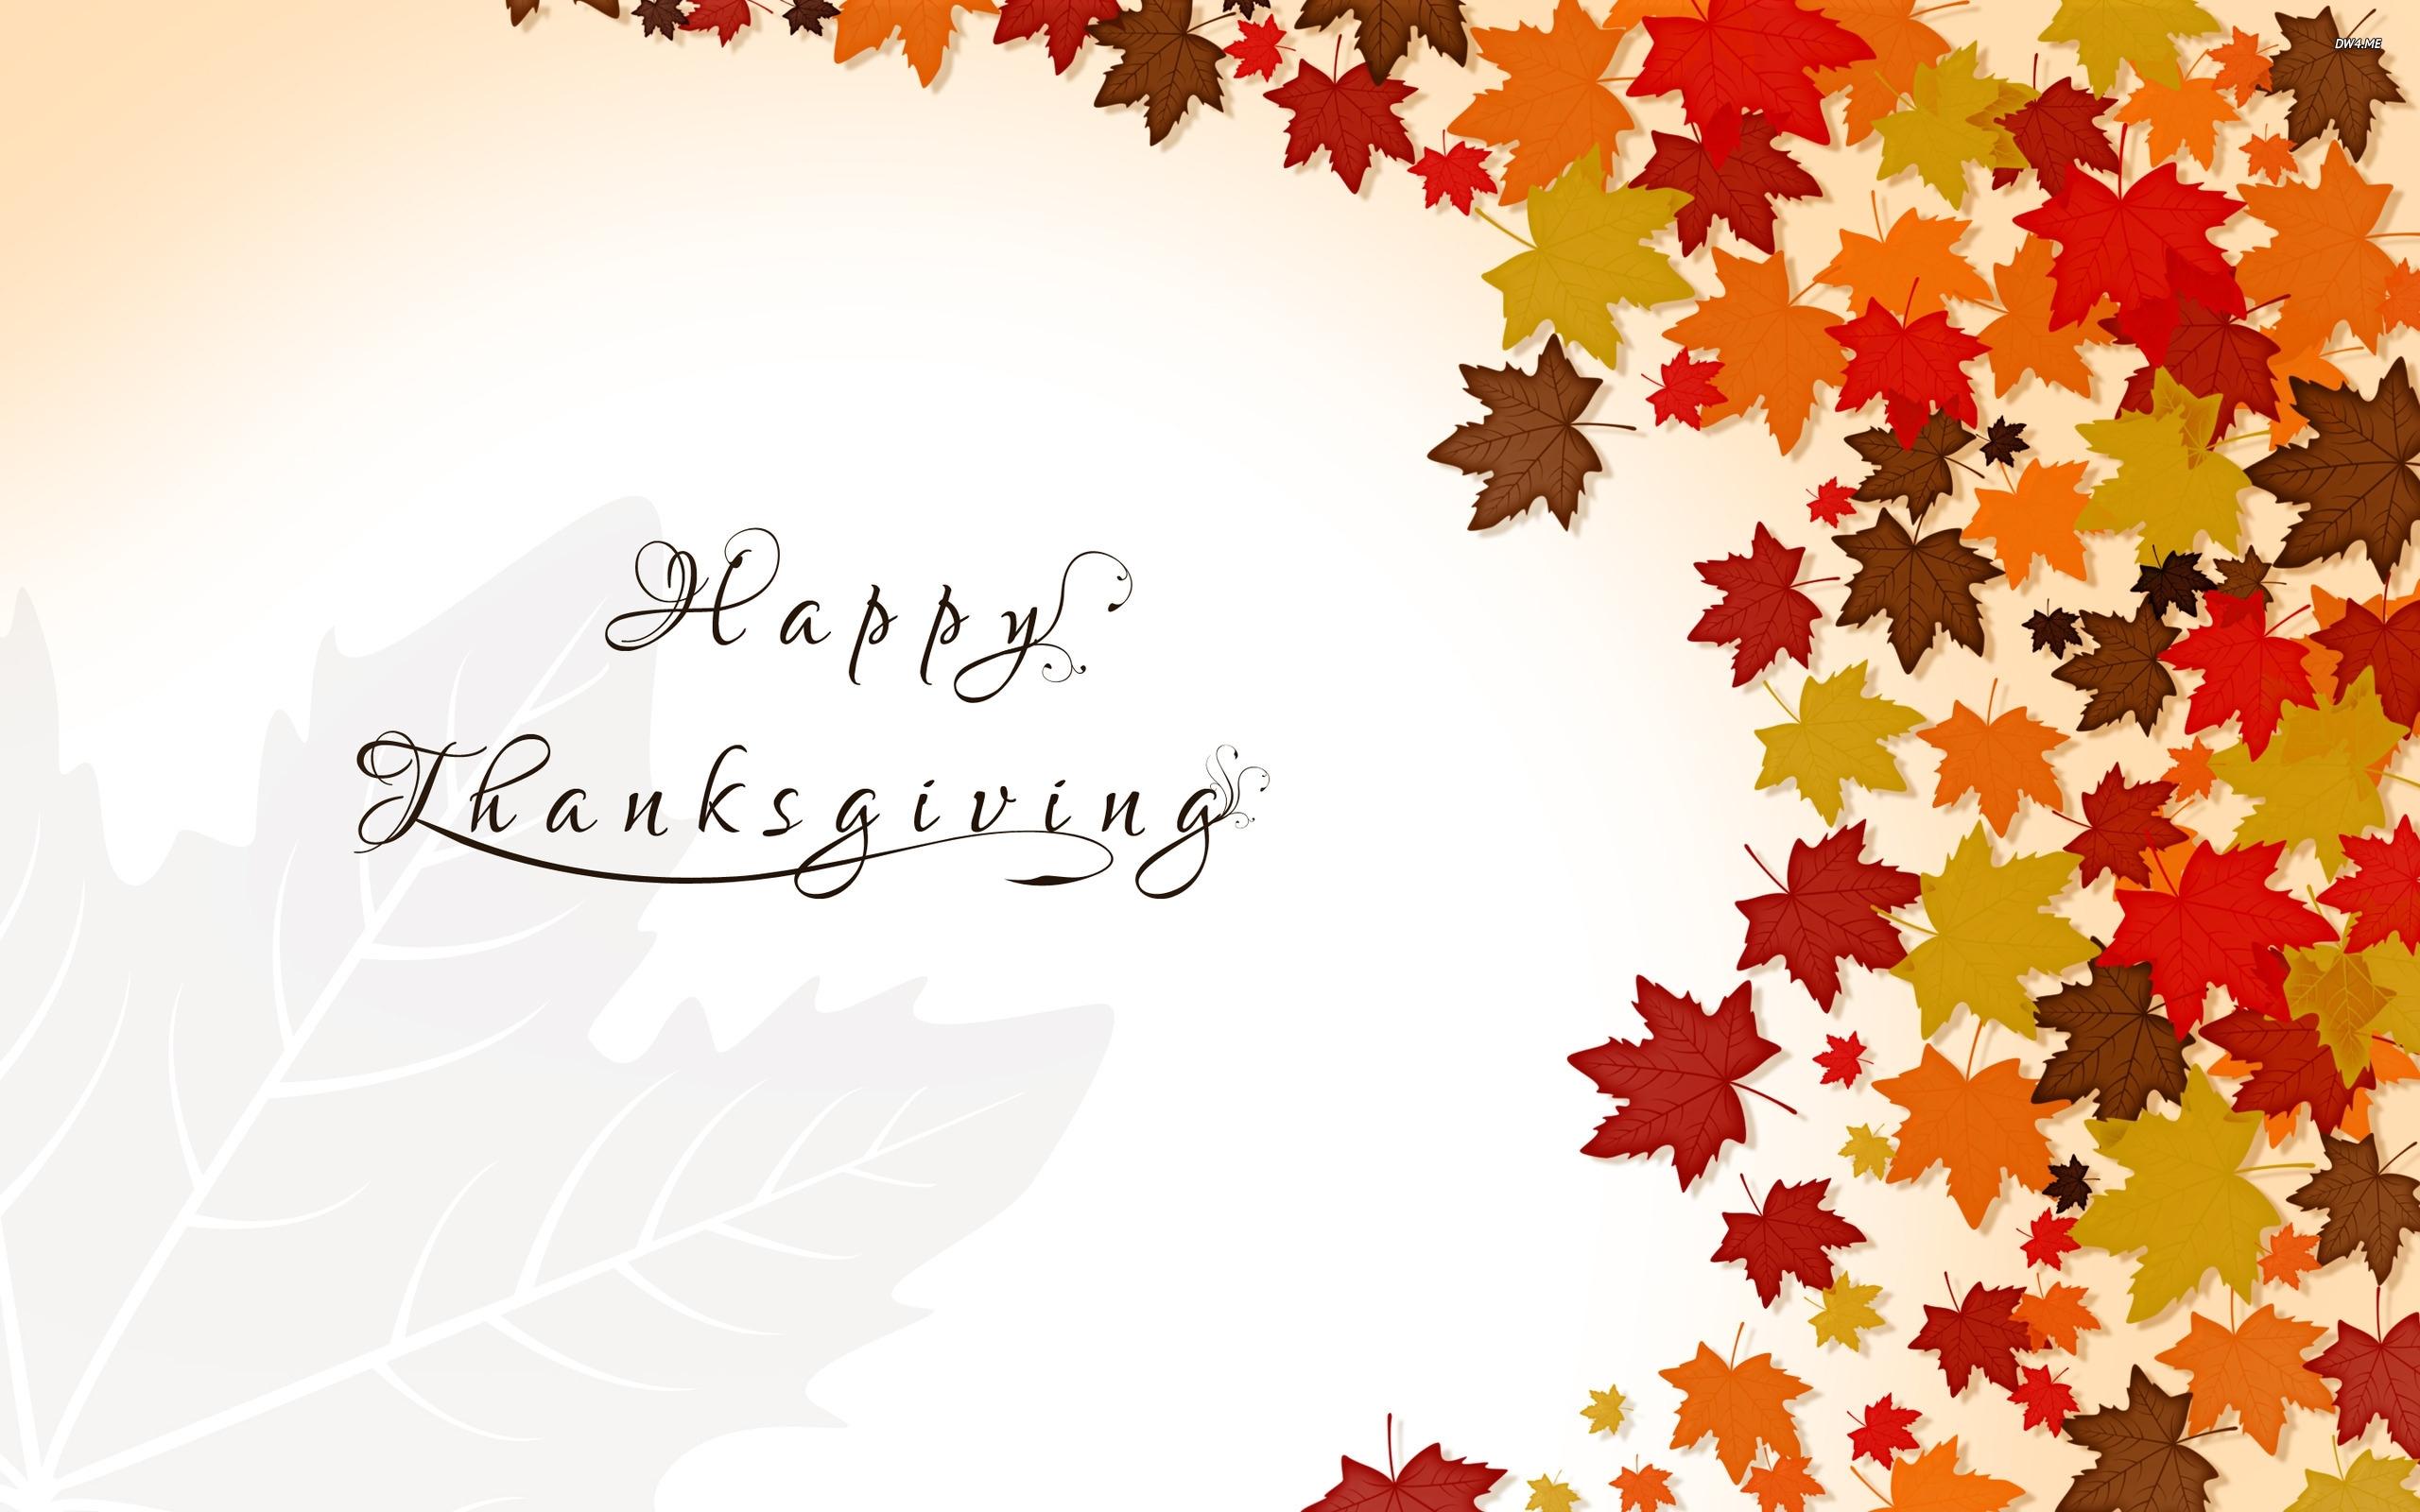 beautifull thanksgiving wallpapers free download | pixelstalk